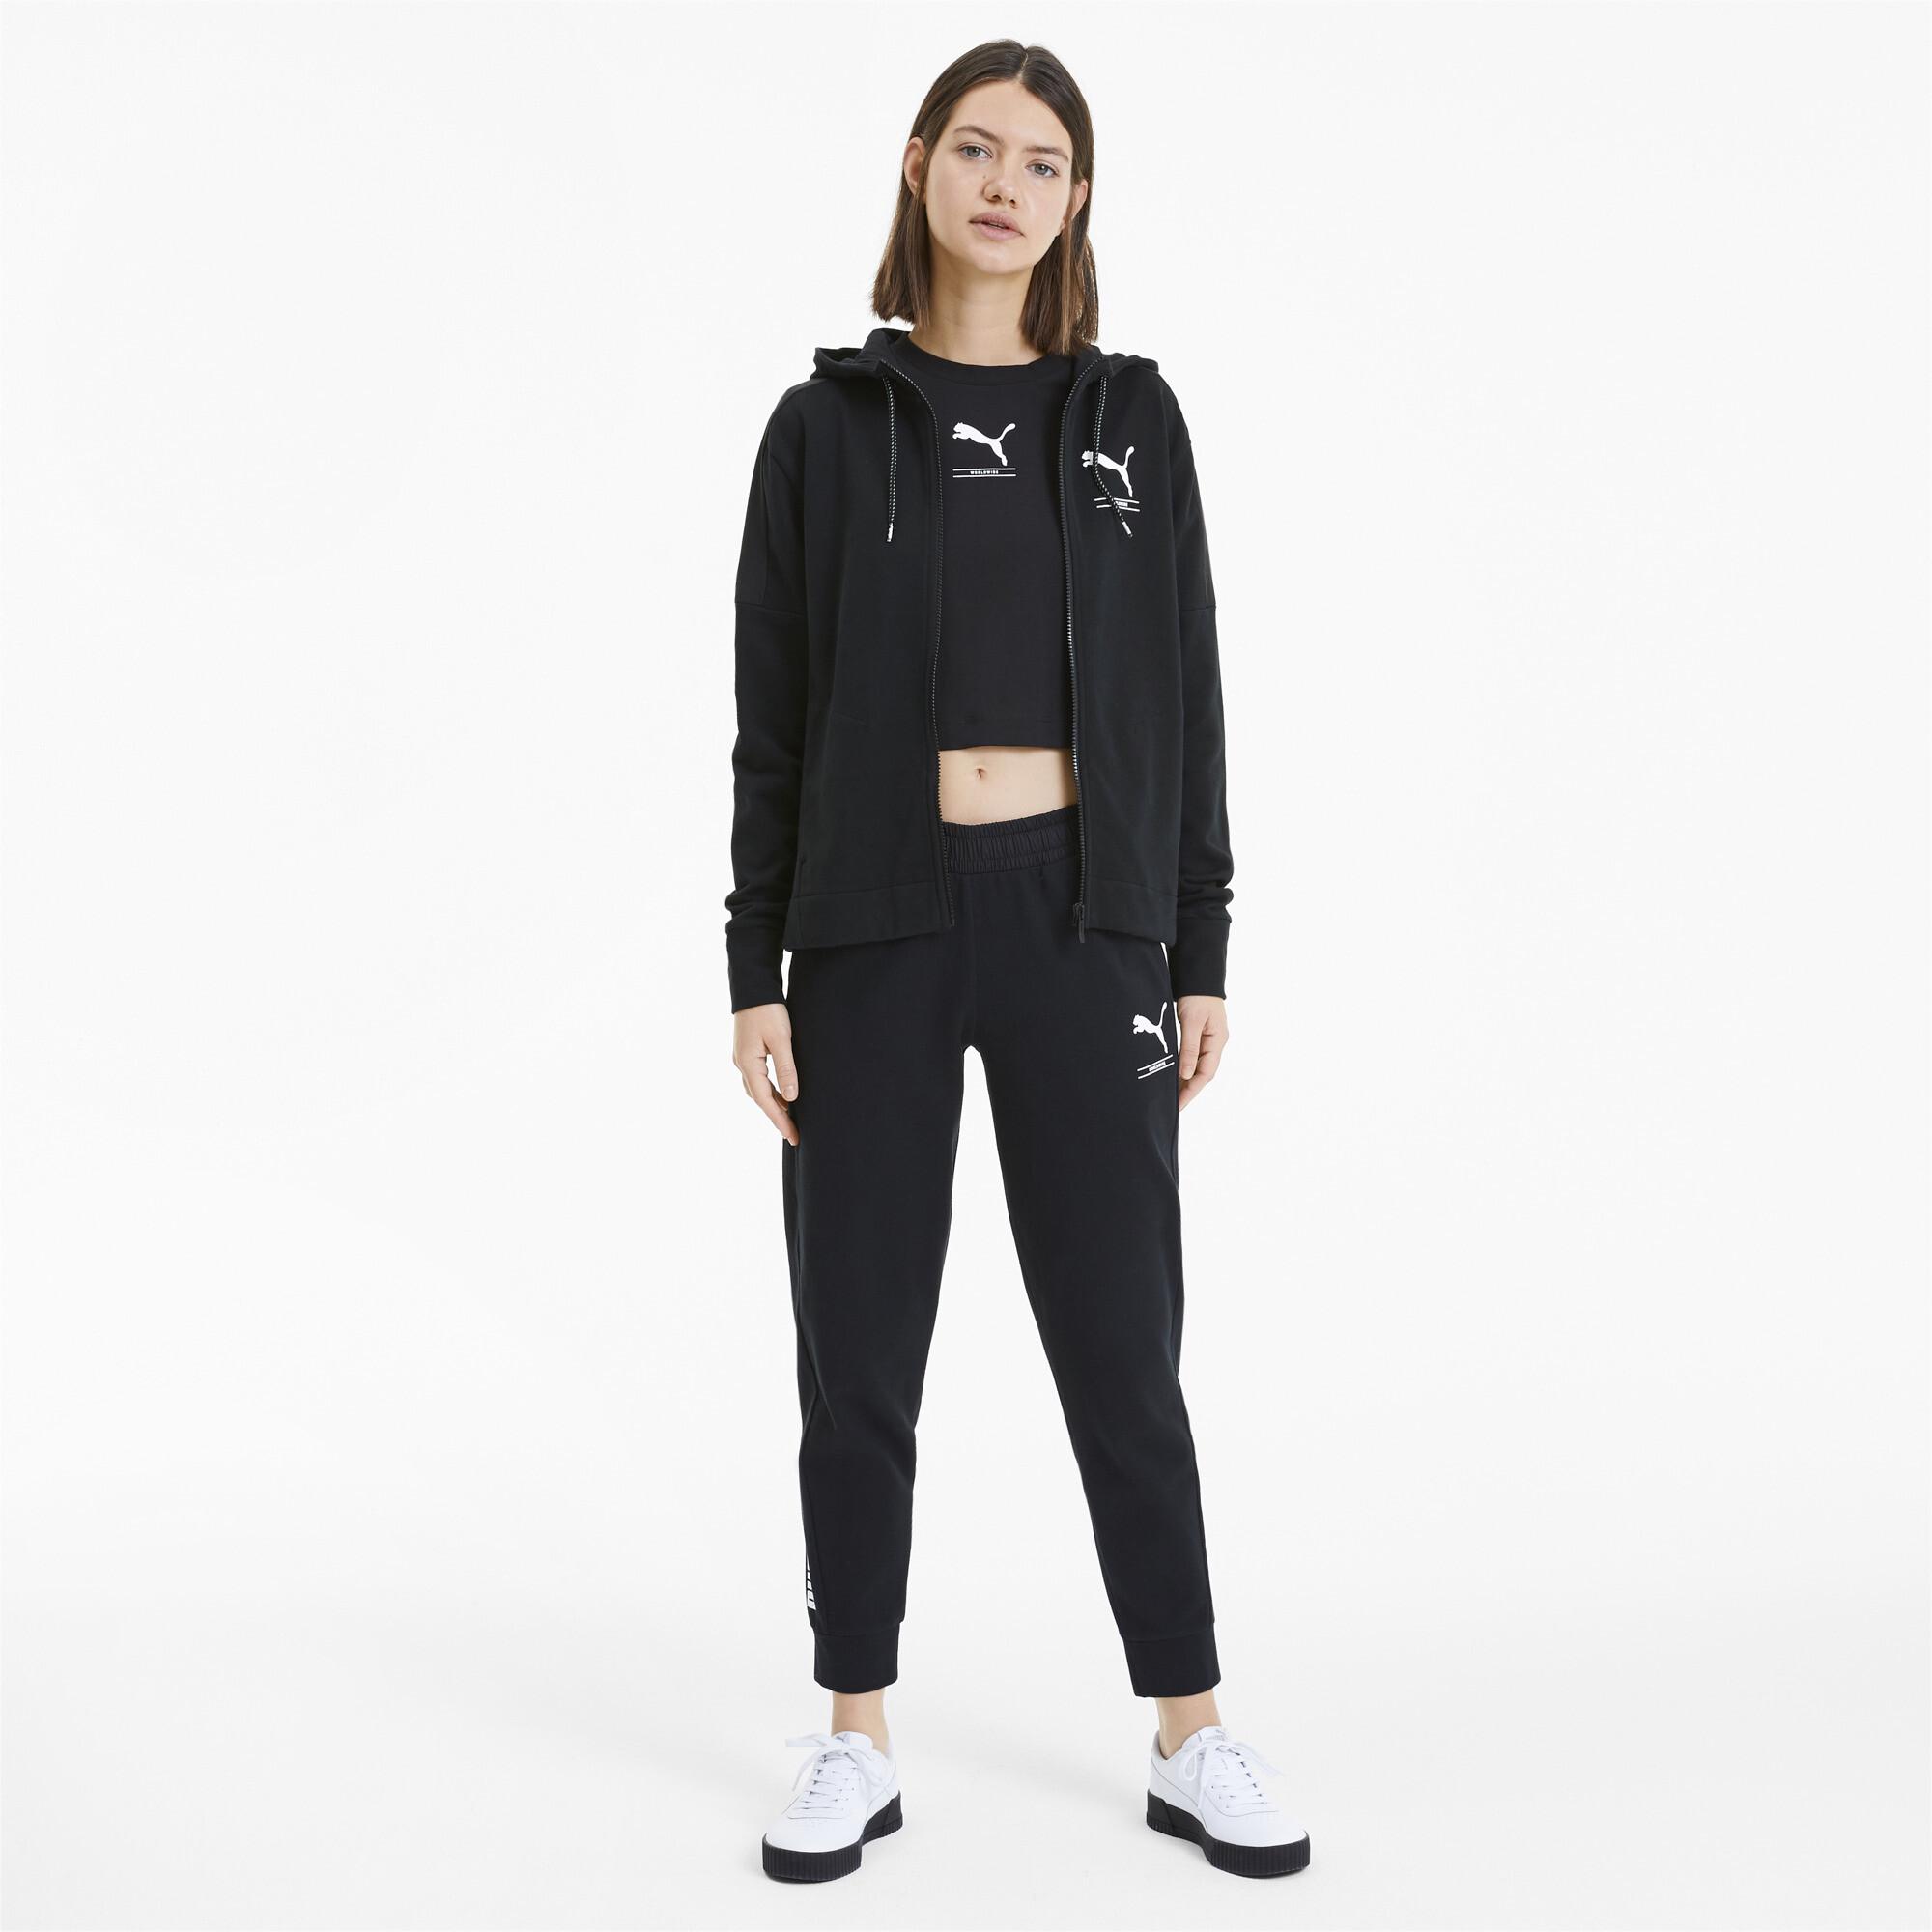 PUMA-NU-TILITY-Women-039-s-Full-Zip-Hoodie-Women-Sweat-Basics miniatuur 11